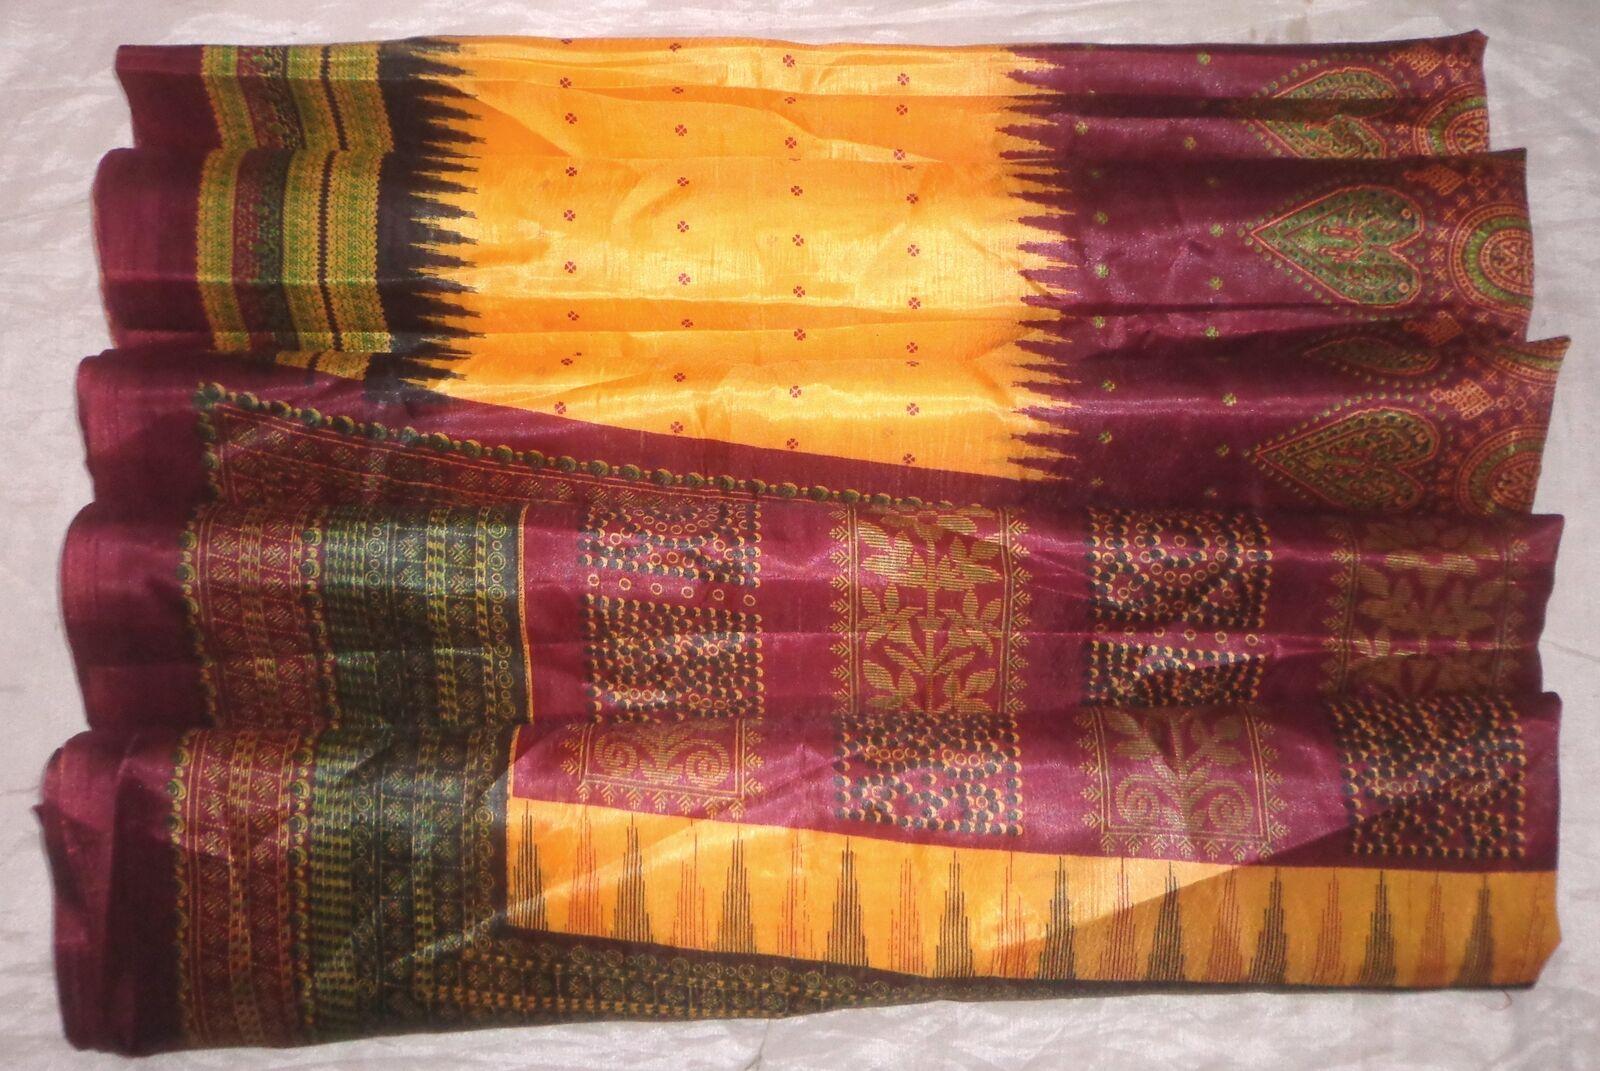 WEARABLE Vintage PAPER ART Silk BLEND CRISP Sari Saree PS2 S301 Yellow Maroon